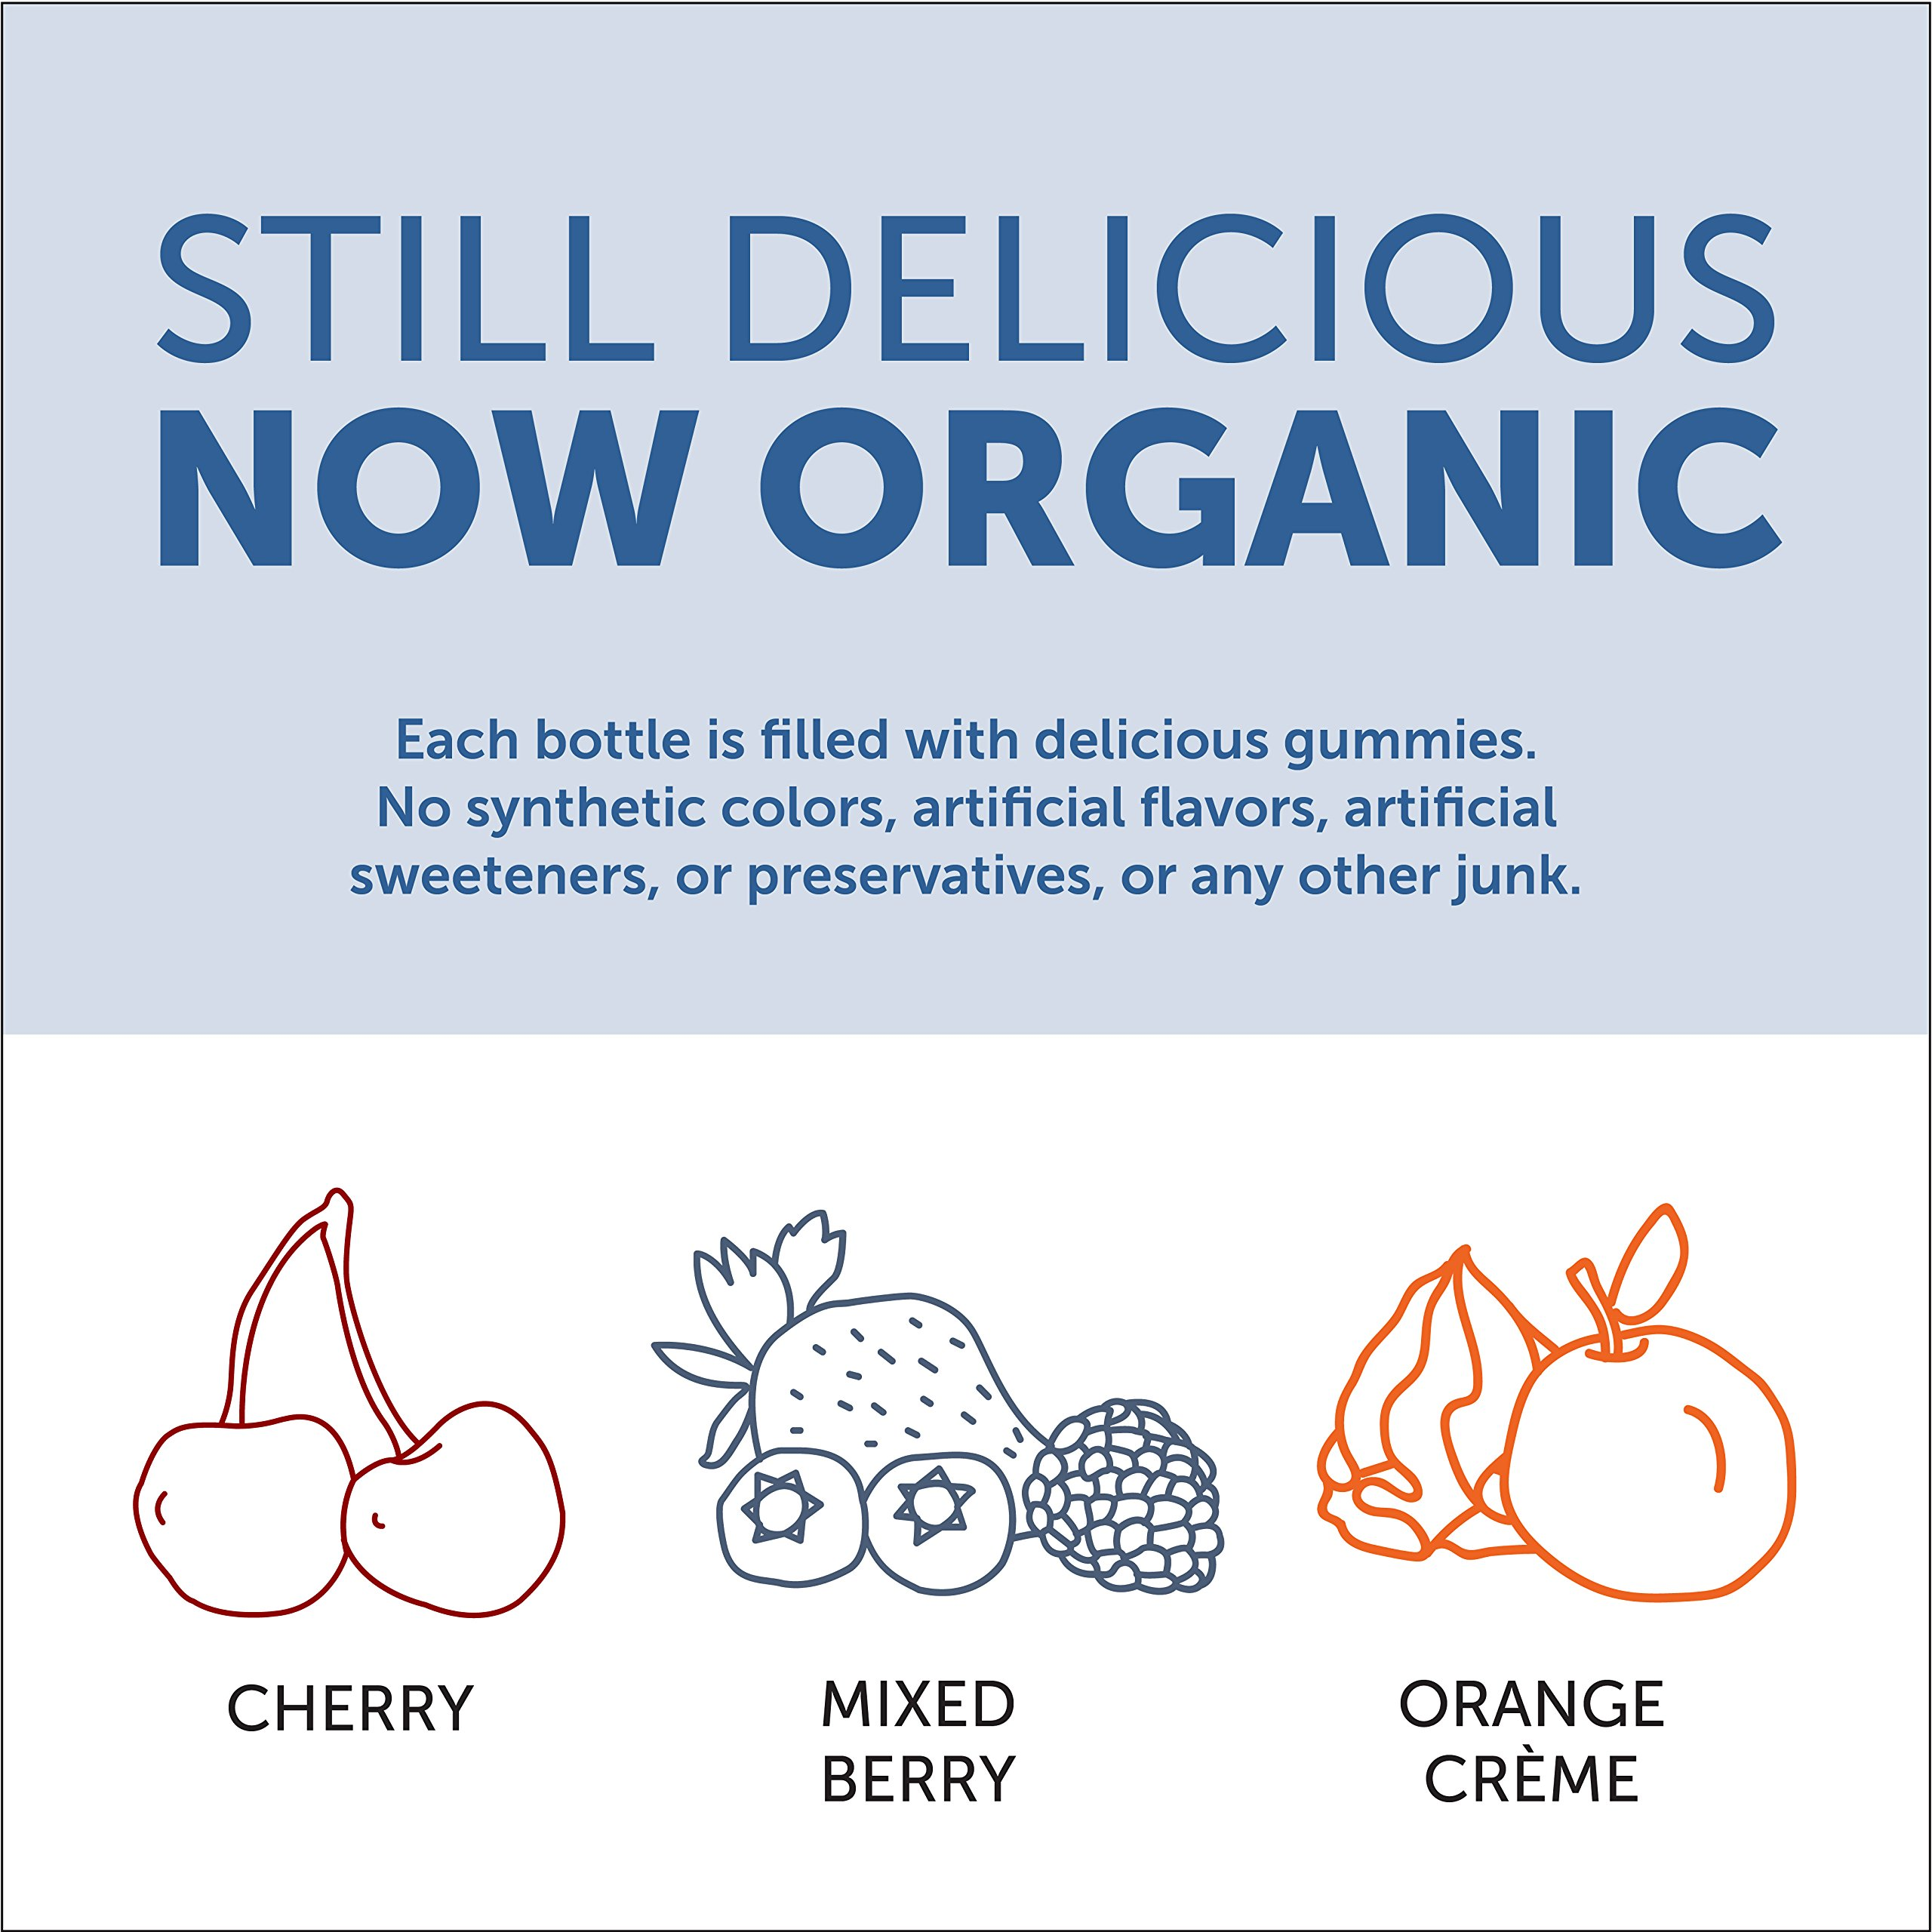 SmartyPants Vegetarian Organic Kids Daily Gummy Vitamins: Multivitamin, Gluten Free, Non-GMO, Omega-3, Probiotic, Vitamin D3, Methylcobalamin B12, Zinc; 120 Count (30 Day Supply) by SmartyPants Vitamins (Image #5)